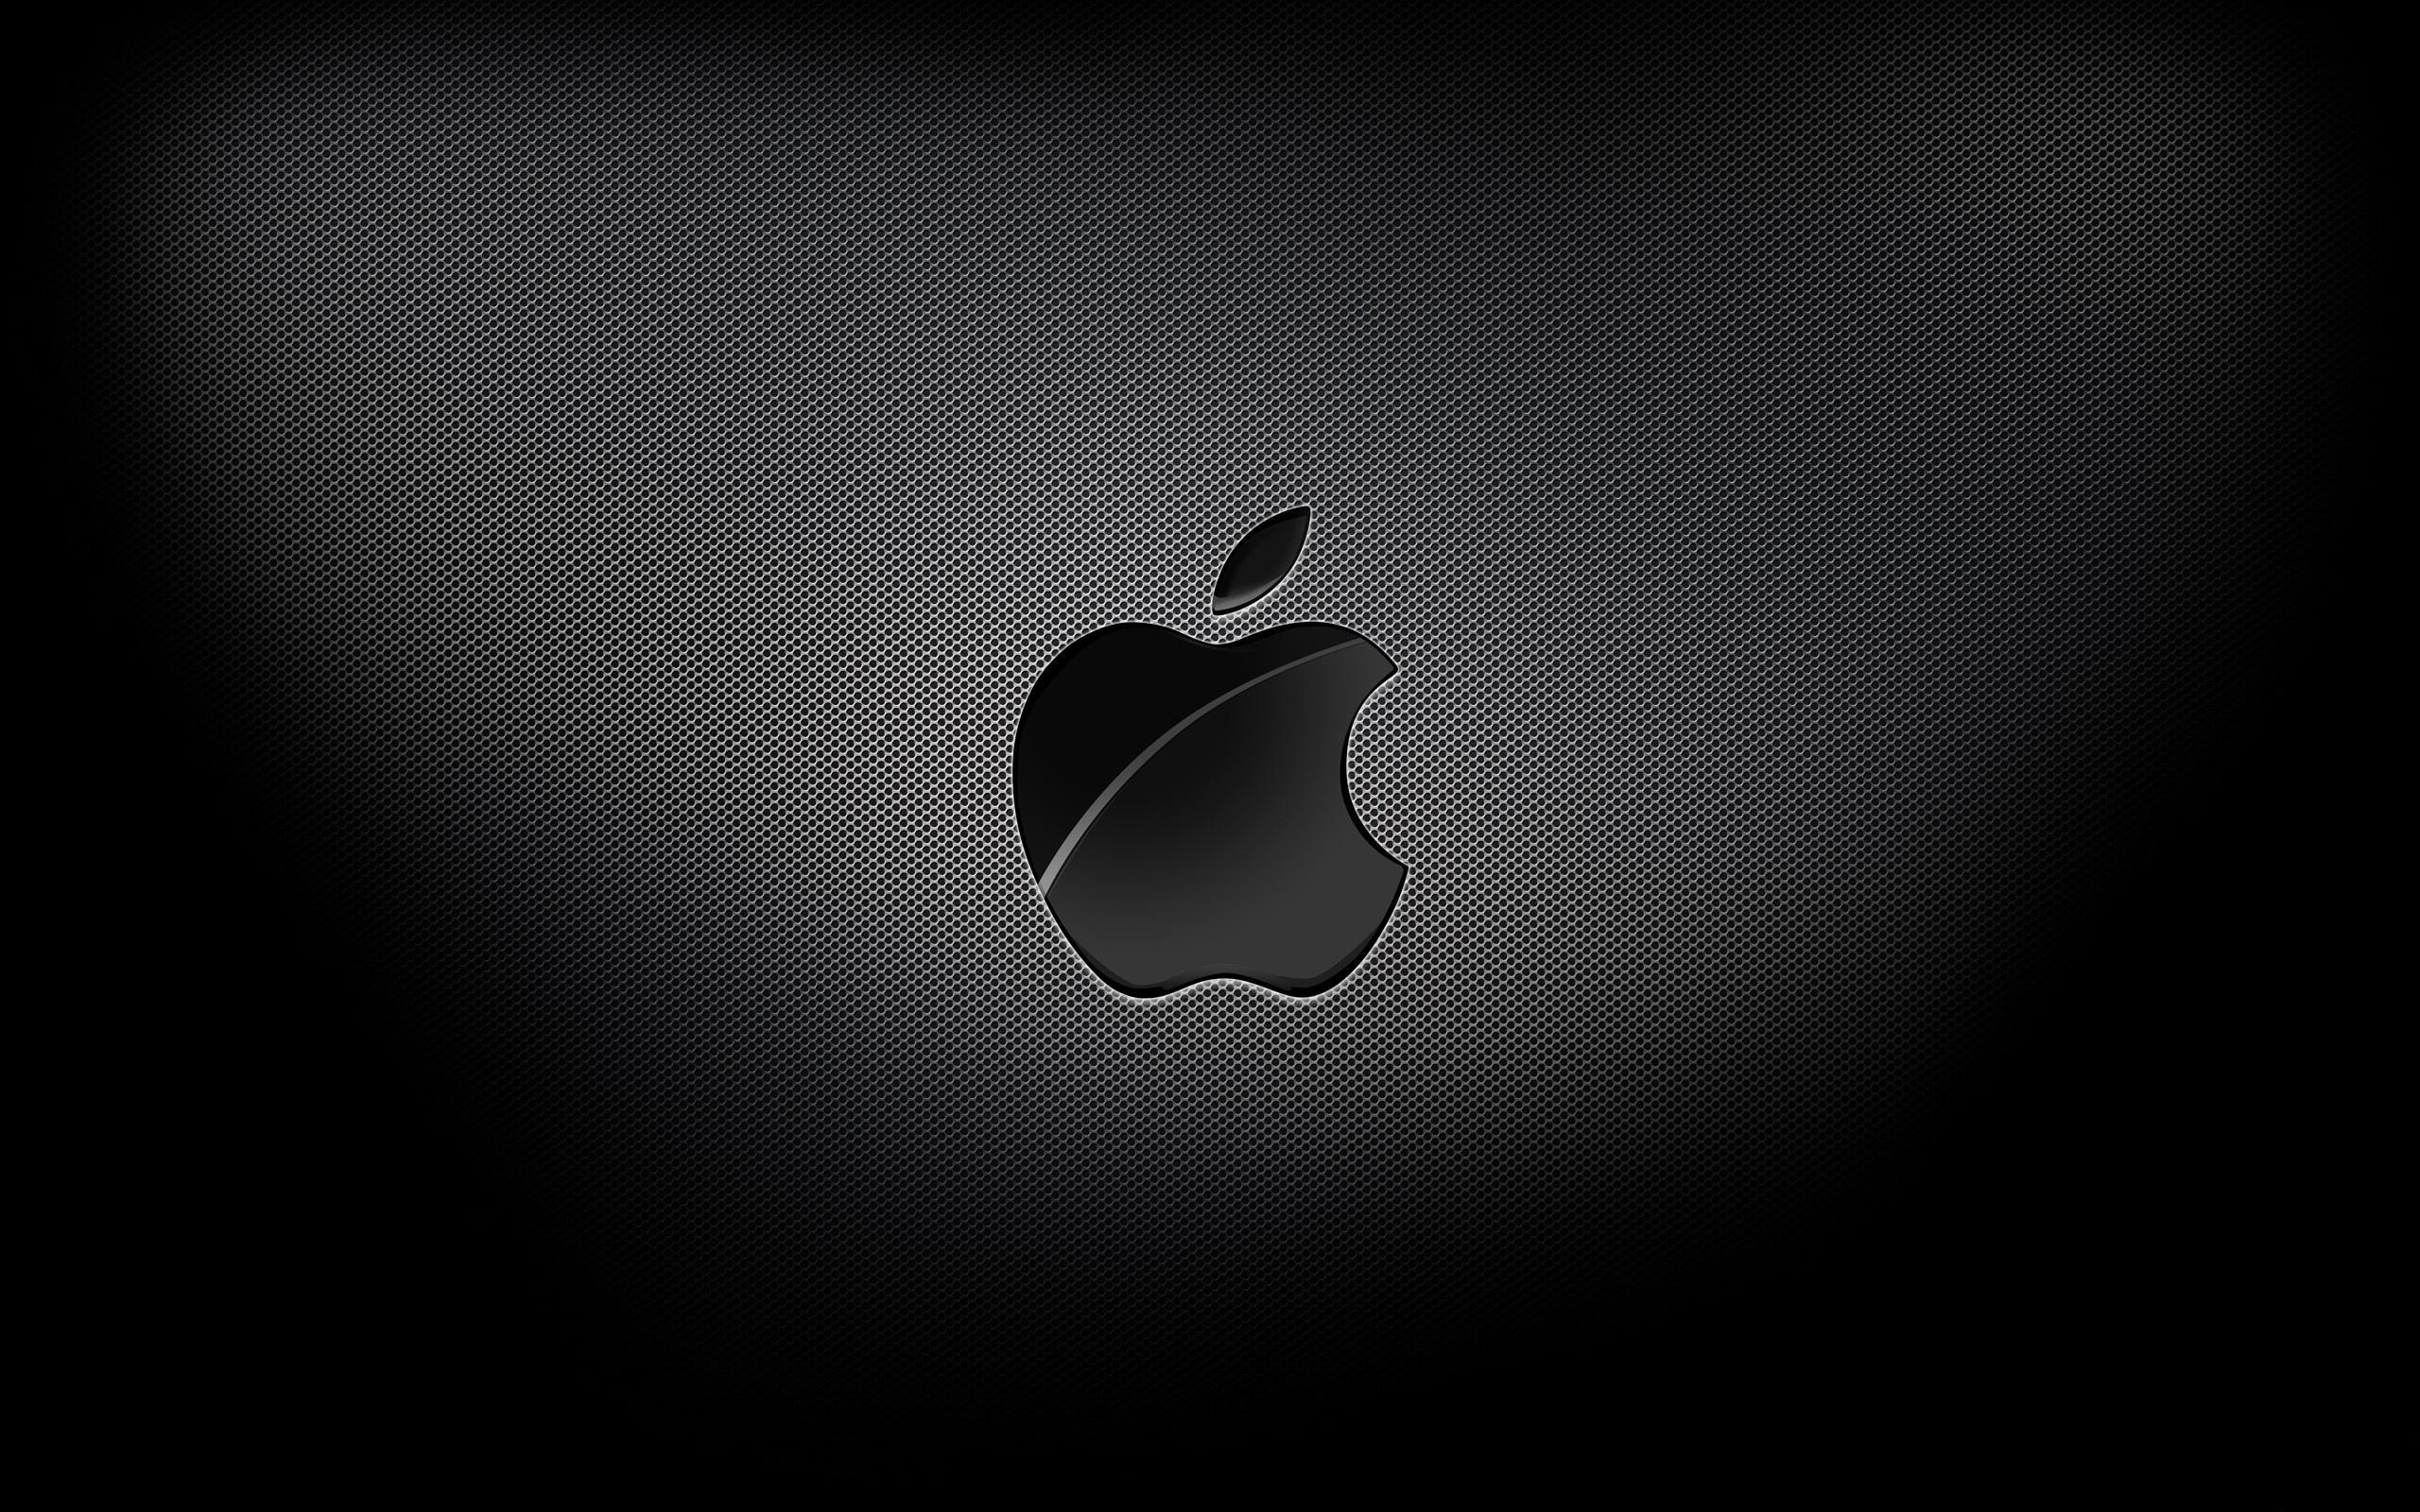 aapple black background mac wallpaper download free mac